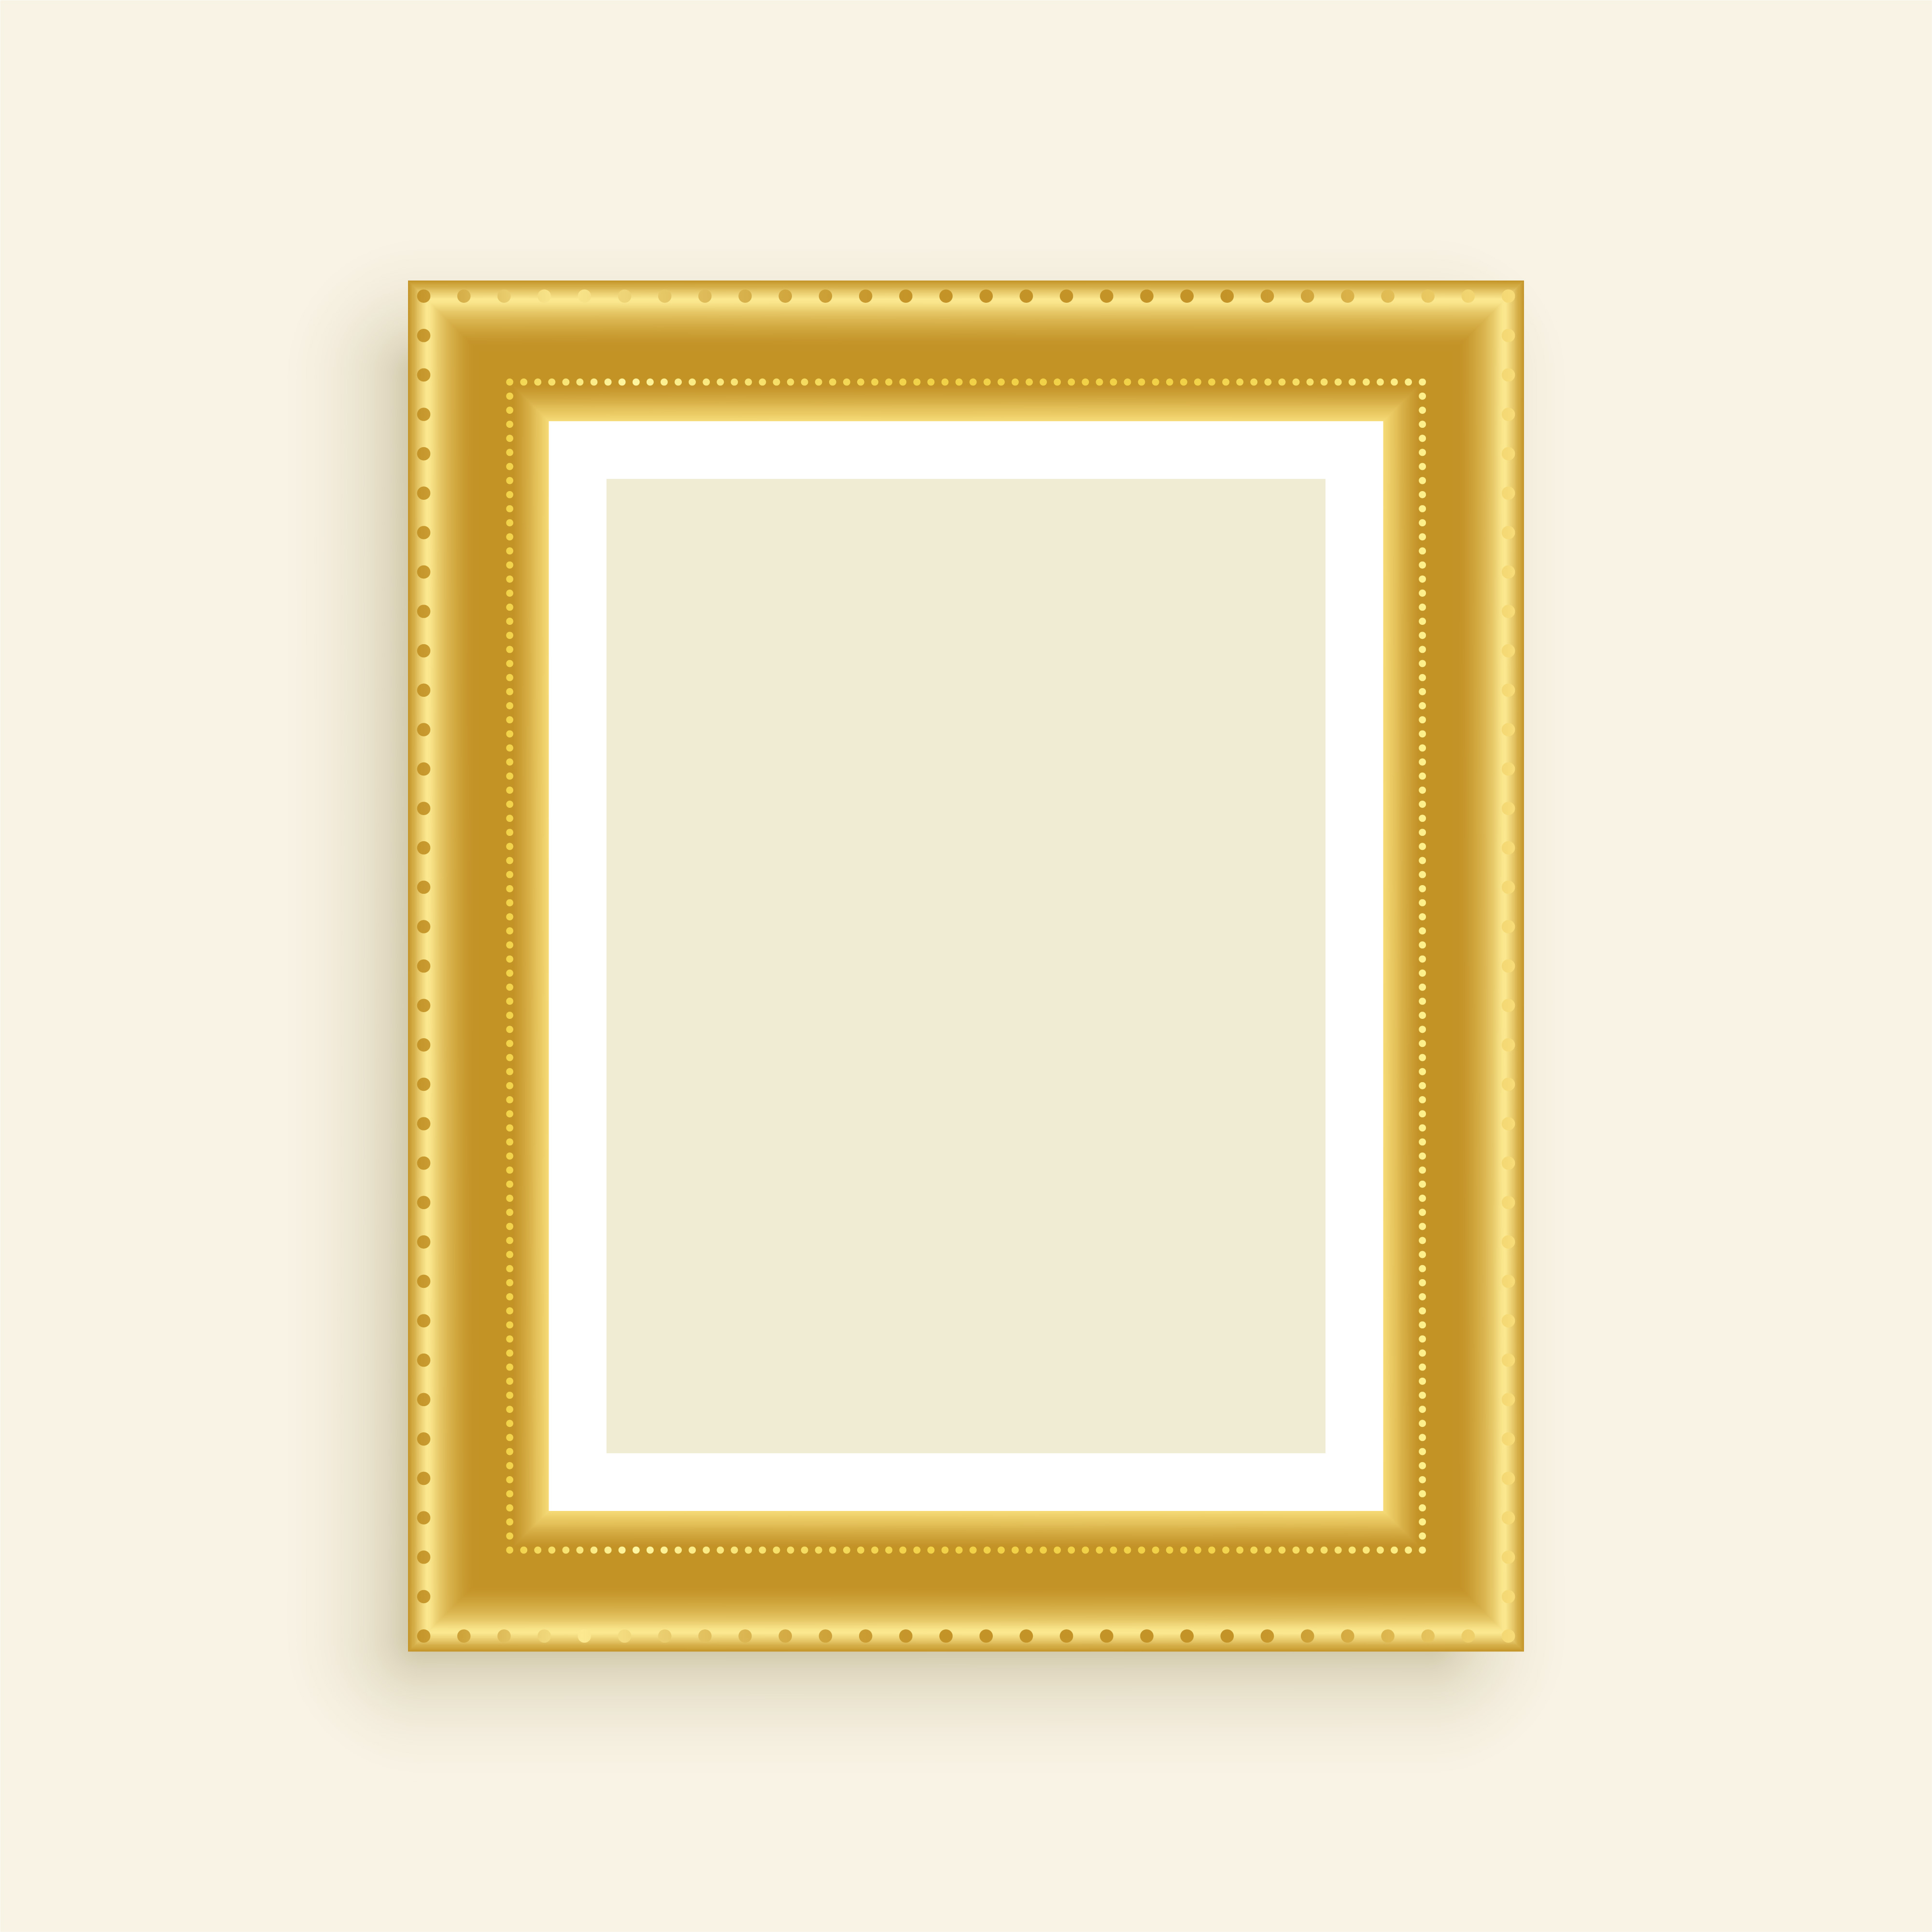 Vintage Luxury Golden Photo Frame Download Free Vector